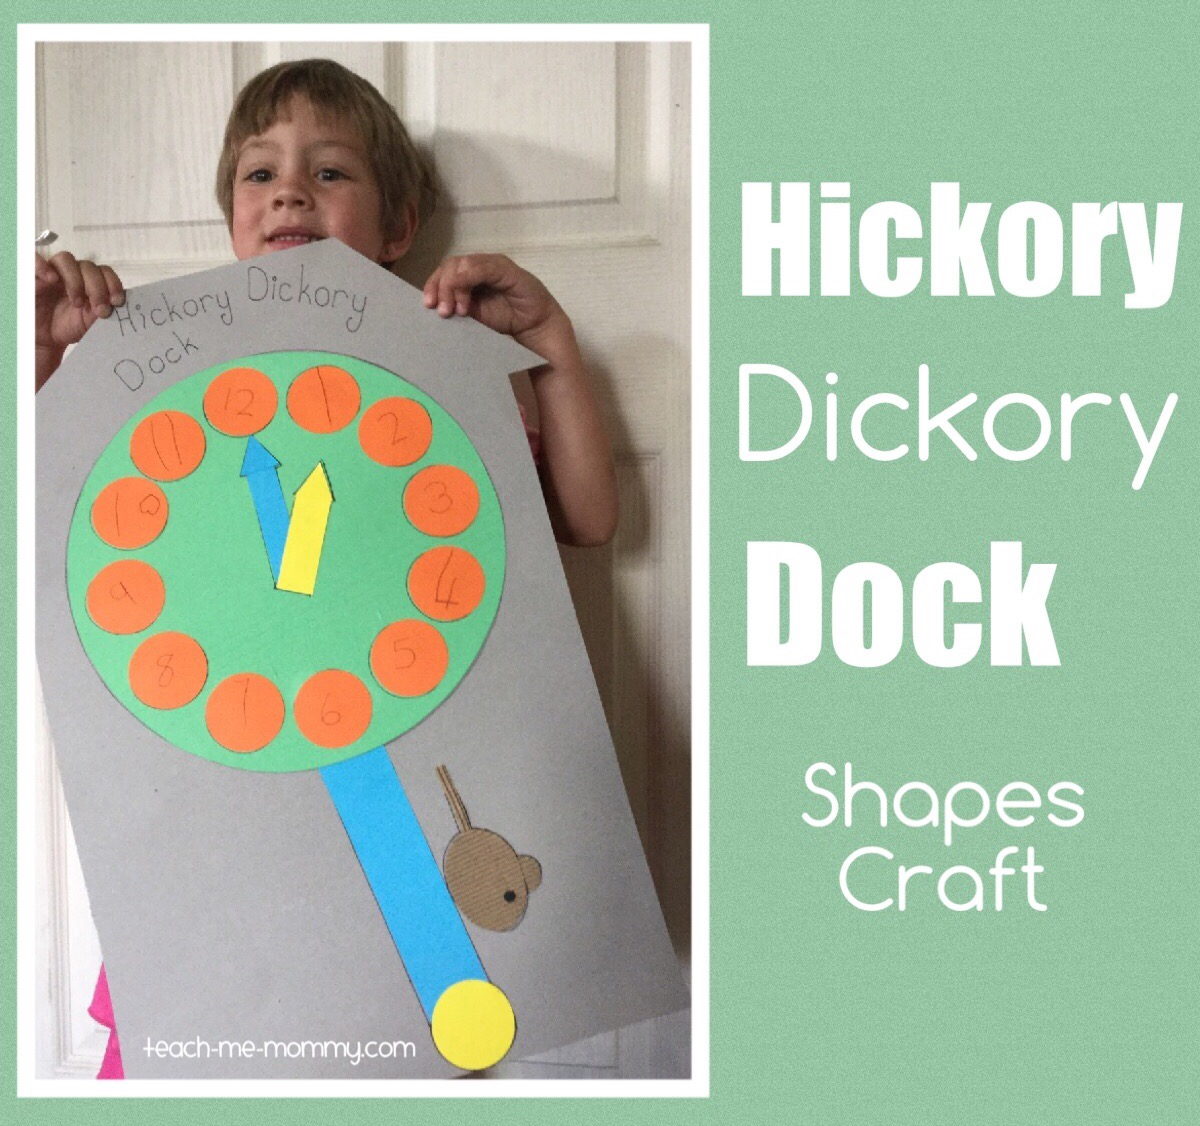 Hickory Dickory Dock Shapes Craft